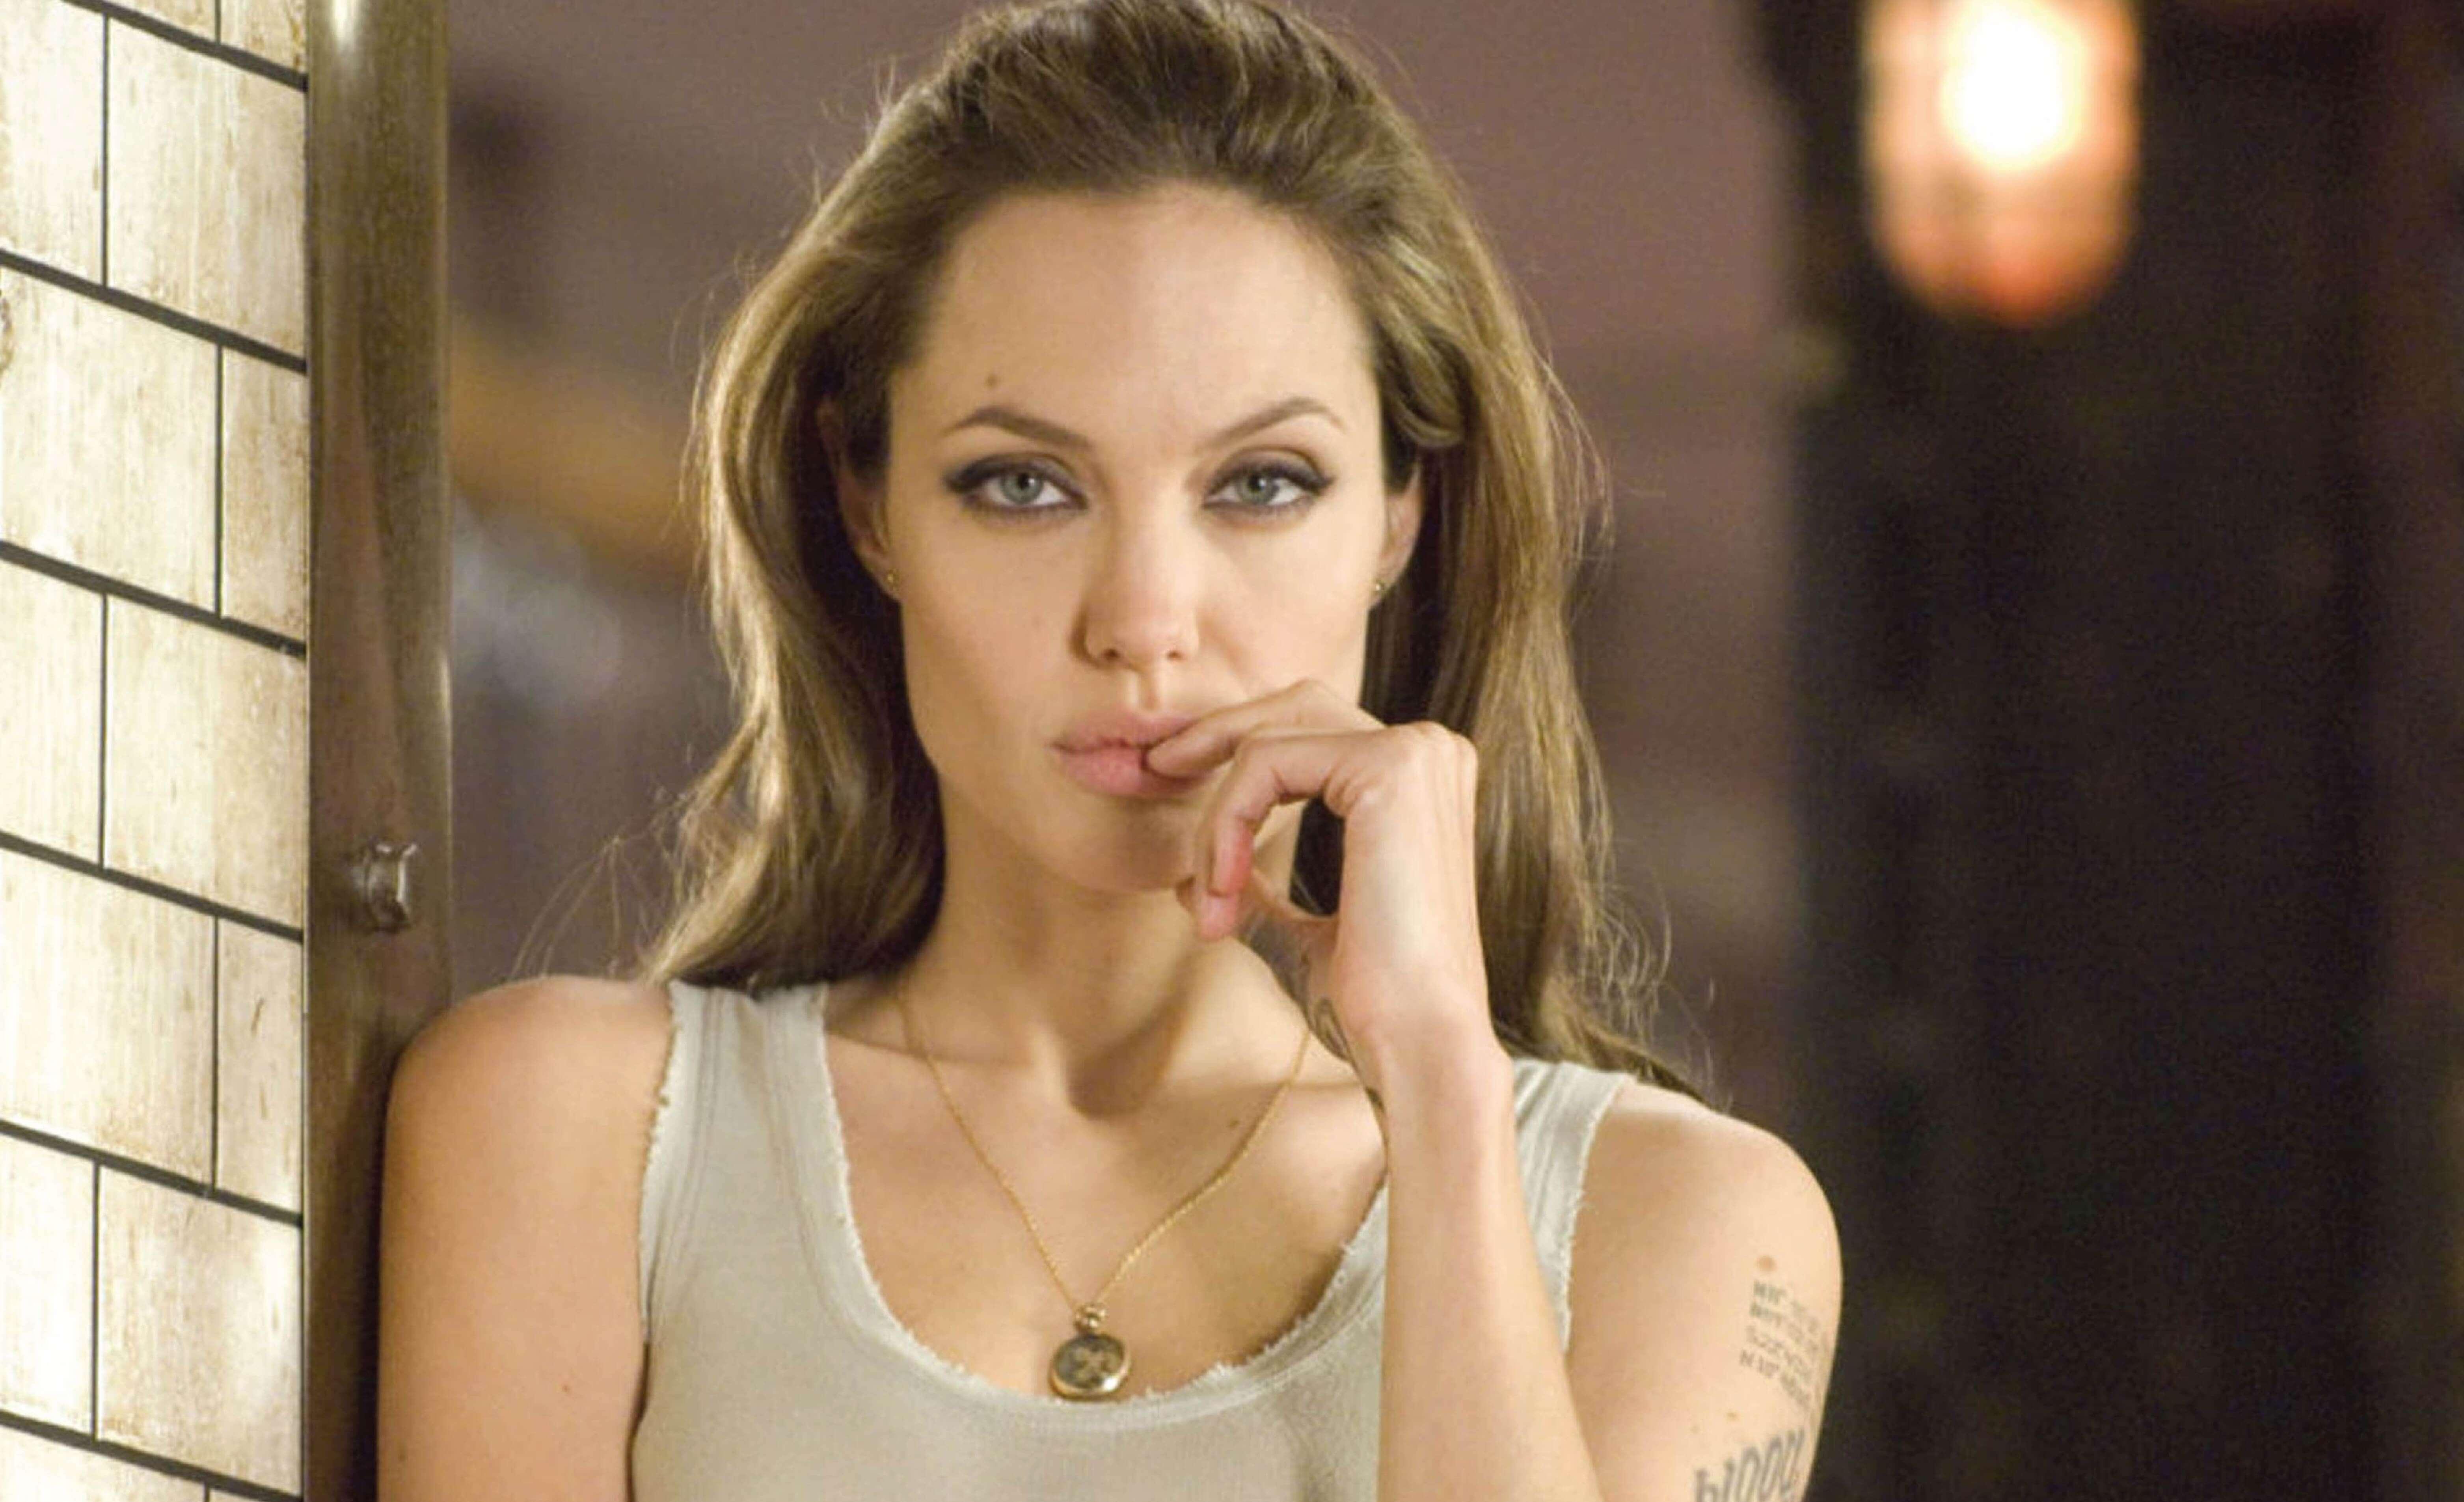 Has Angelina Jolie had Cosmetic Surgery?